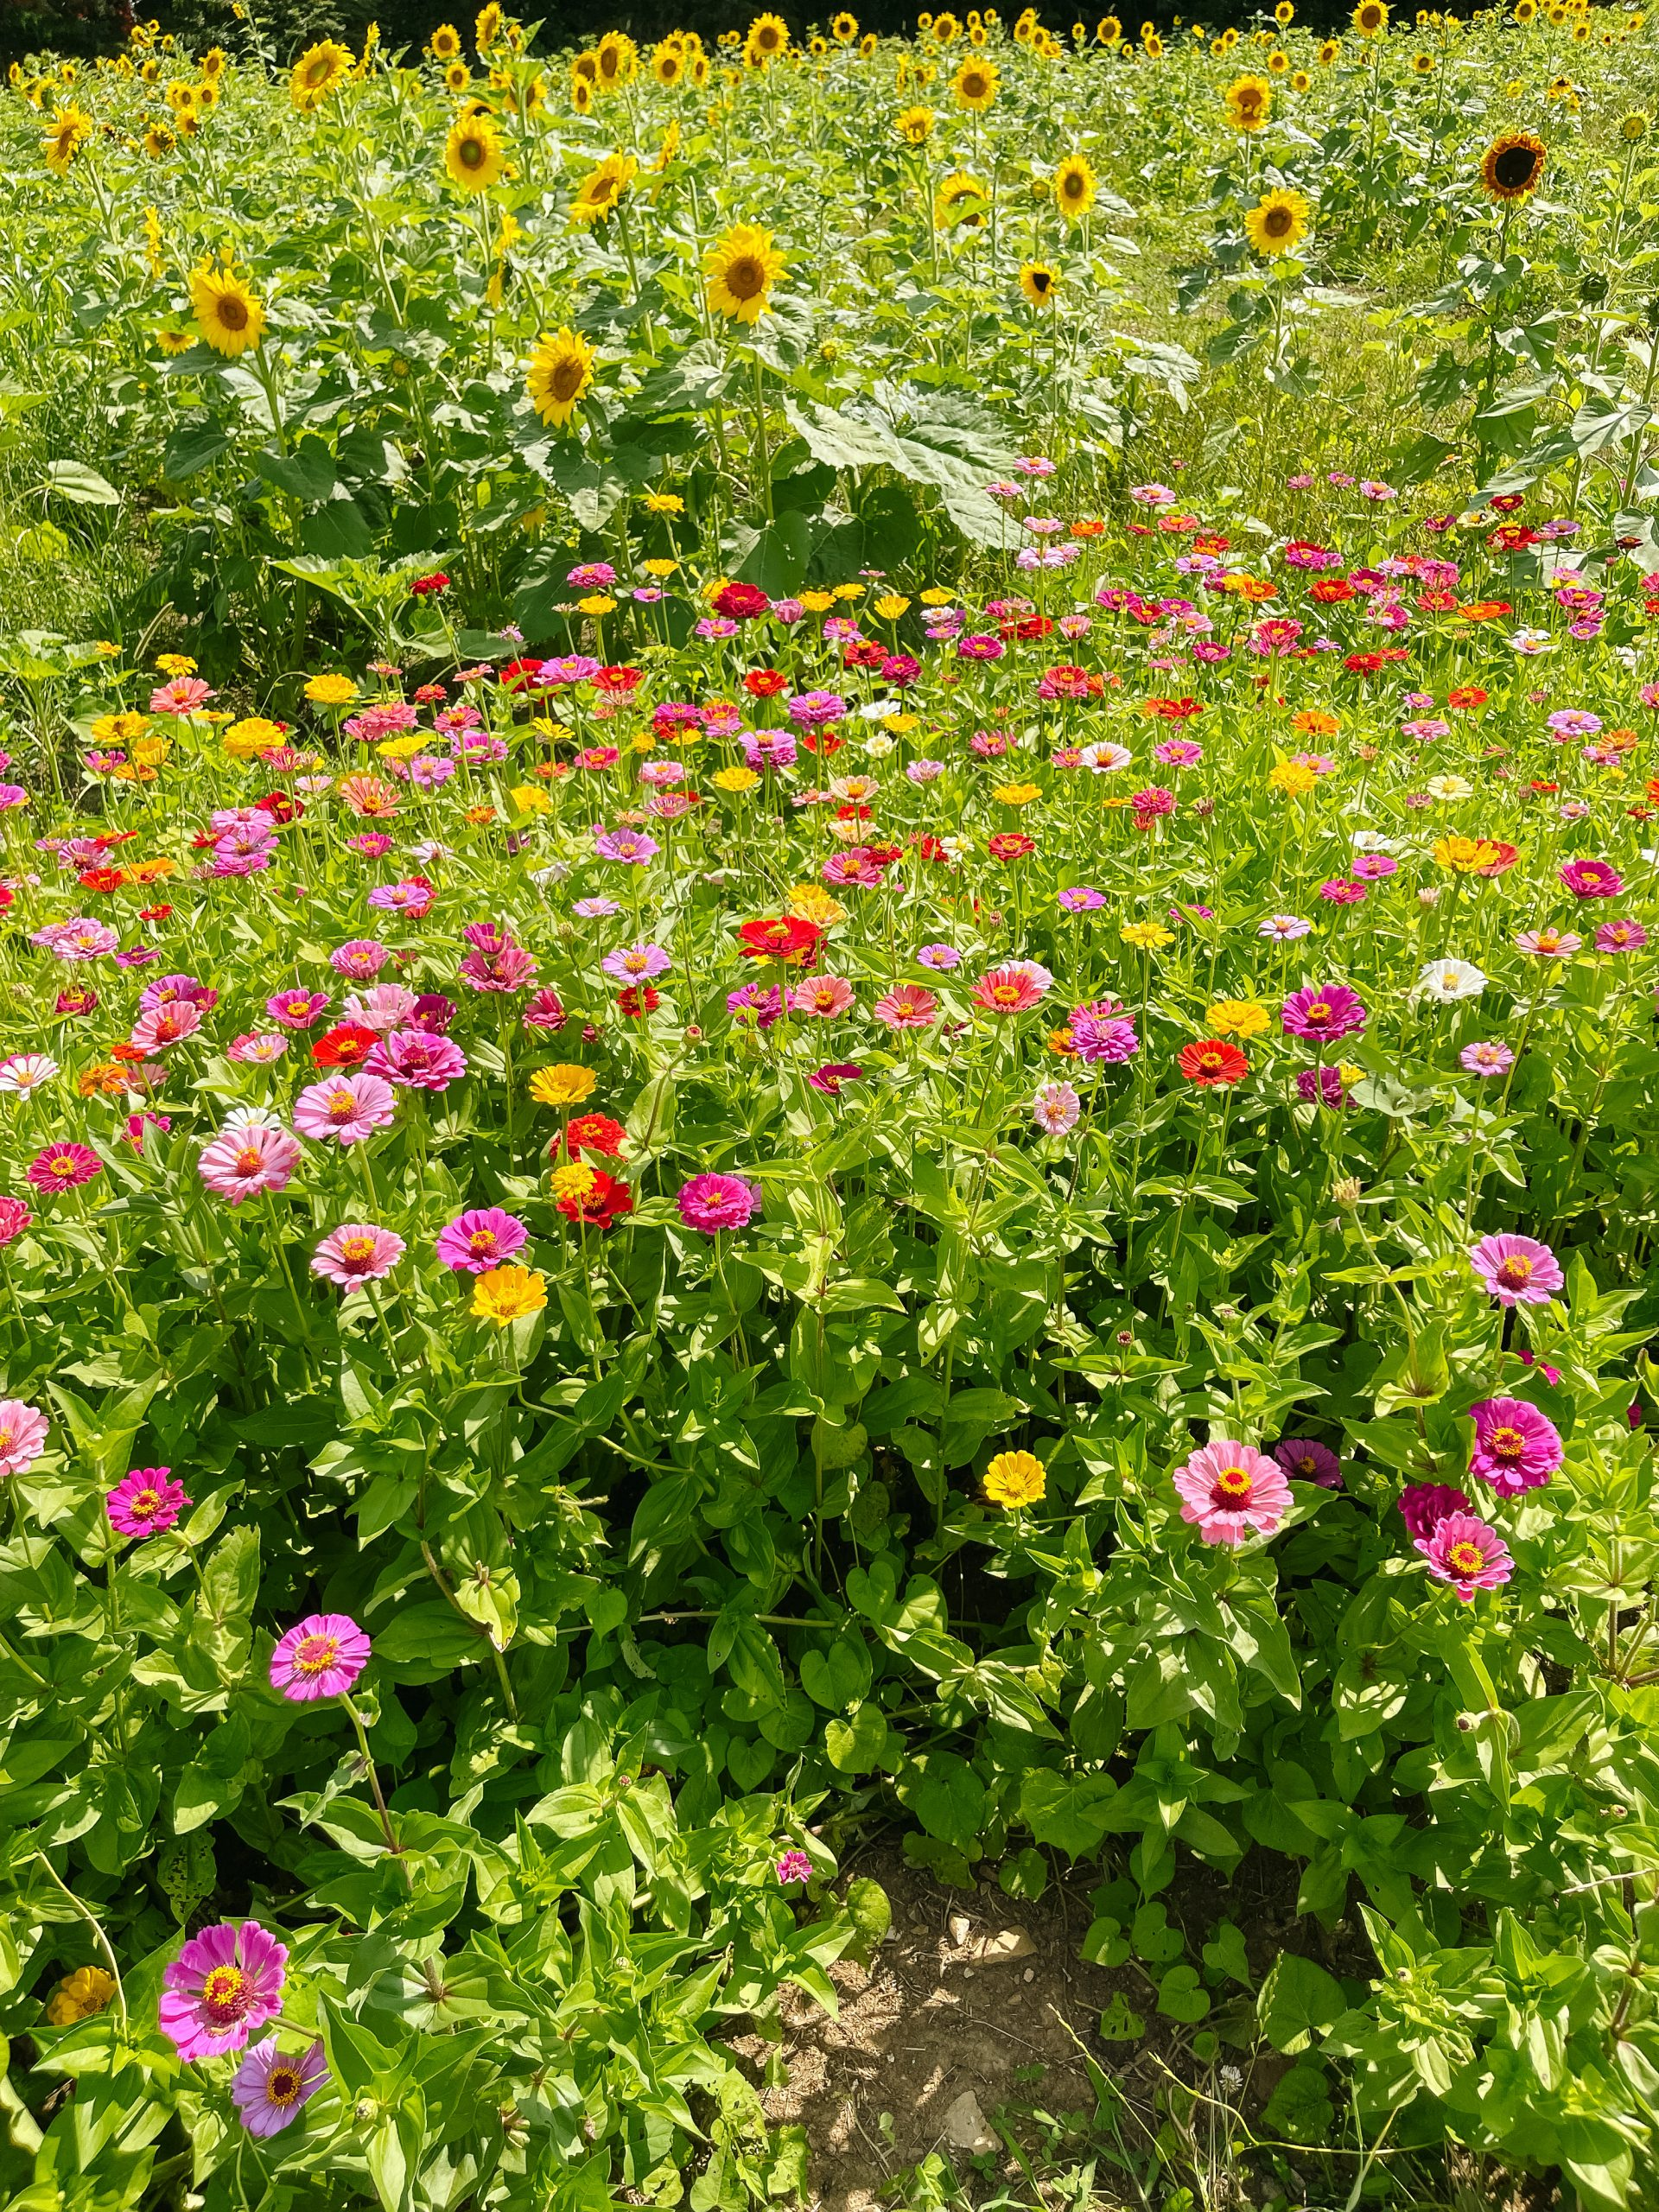 Lucky Ladd Farms flowers sunflower field angela lanter